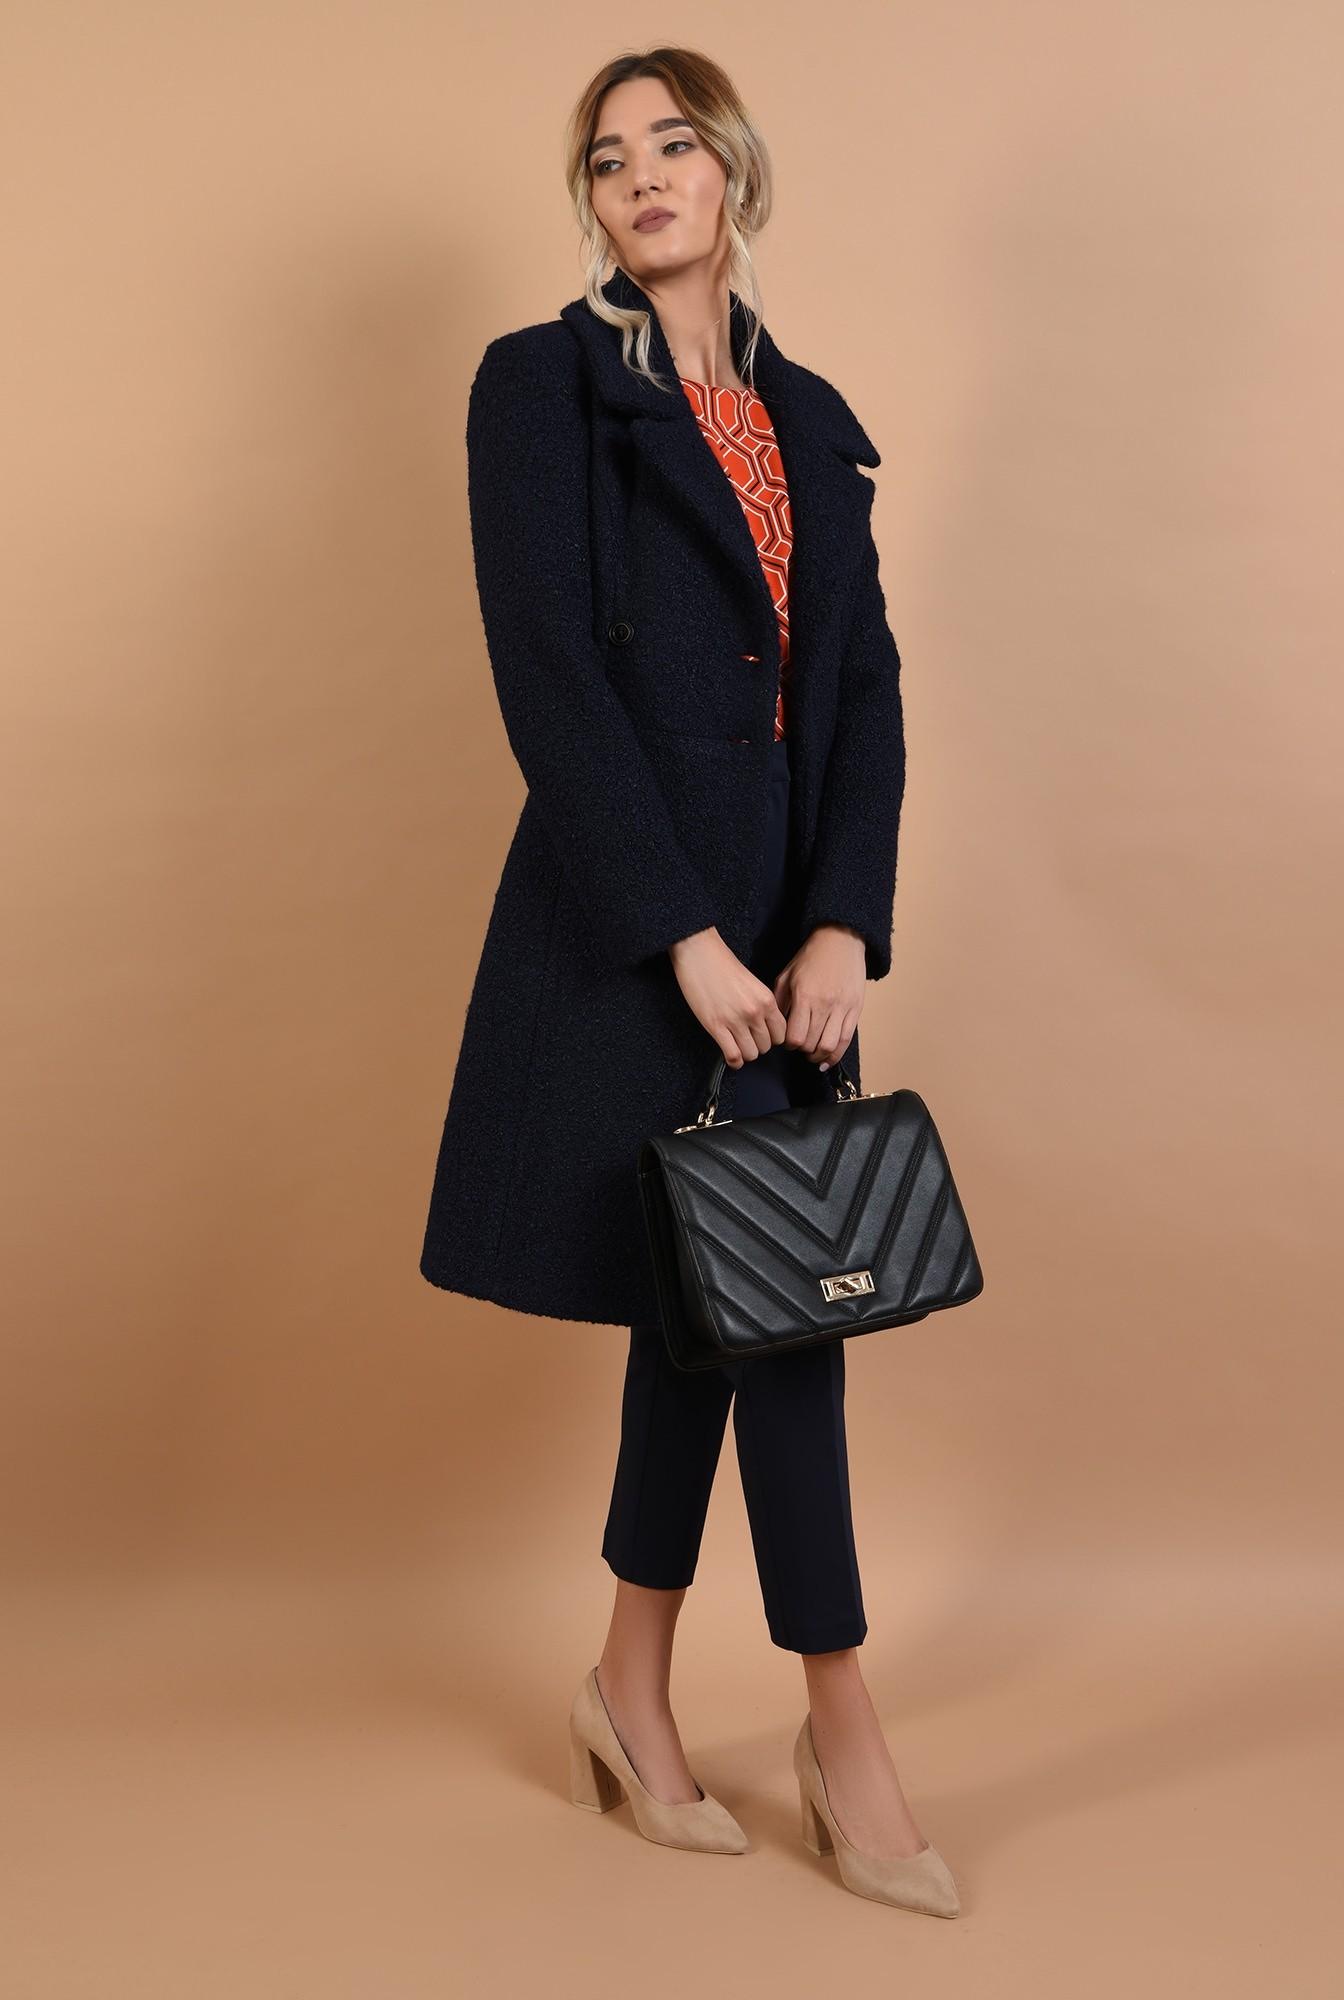 3 - palton bleumarin, cu nasturi, revere crestate, anchior petrecut